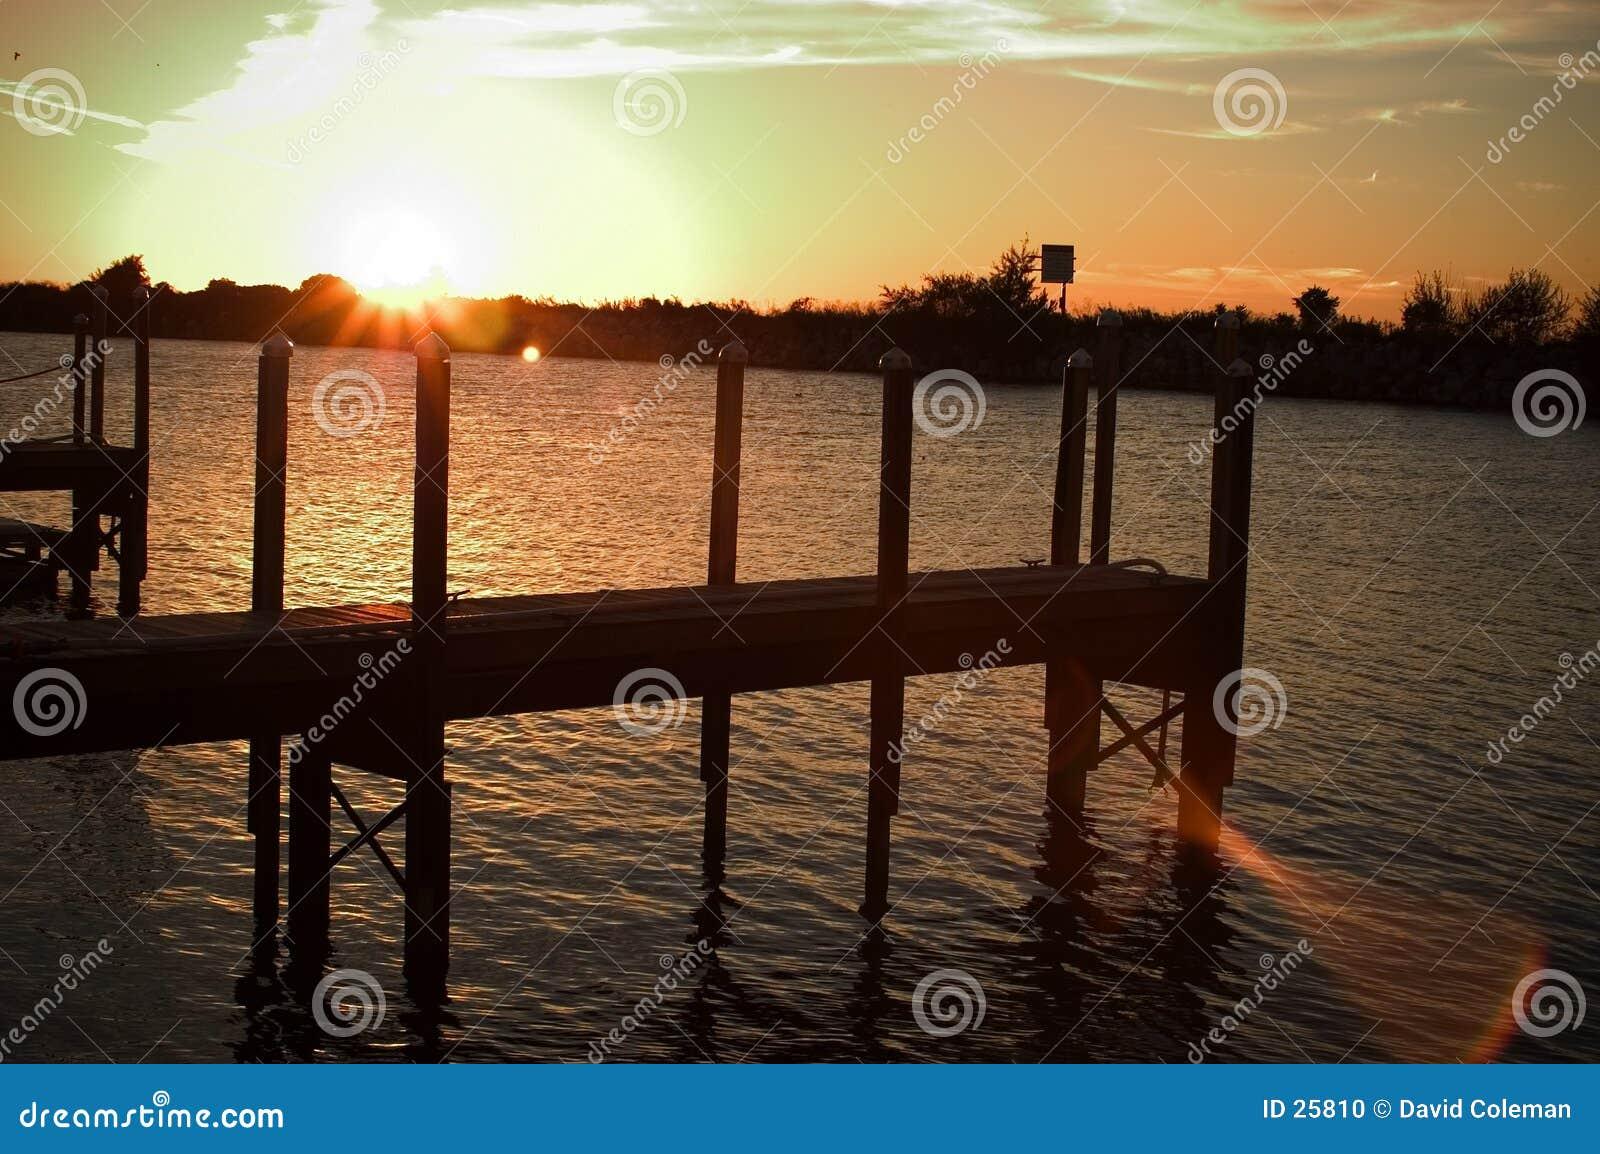 Dock am Sonnenuntergang